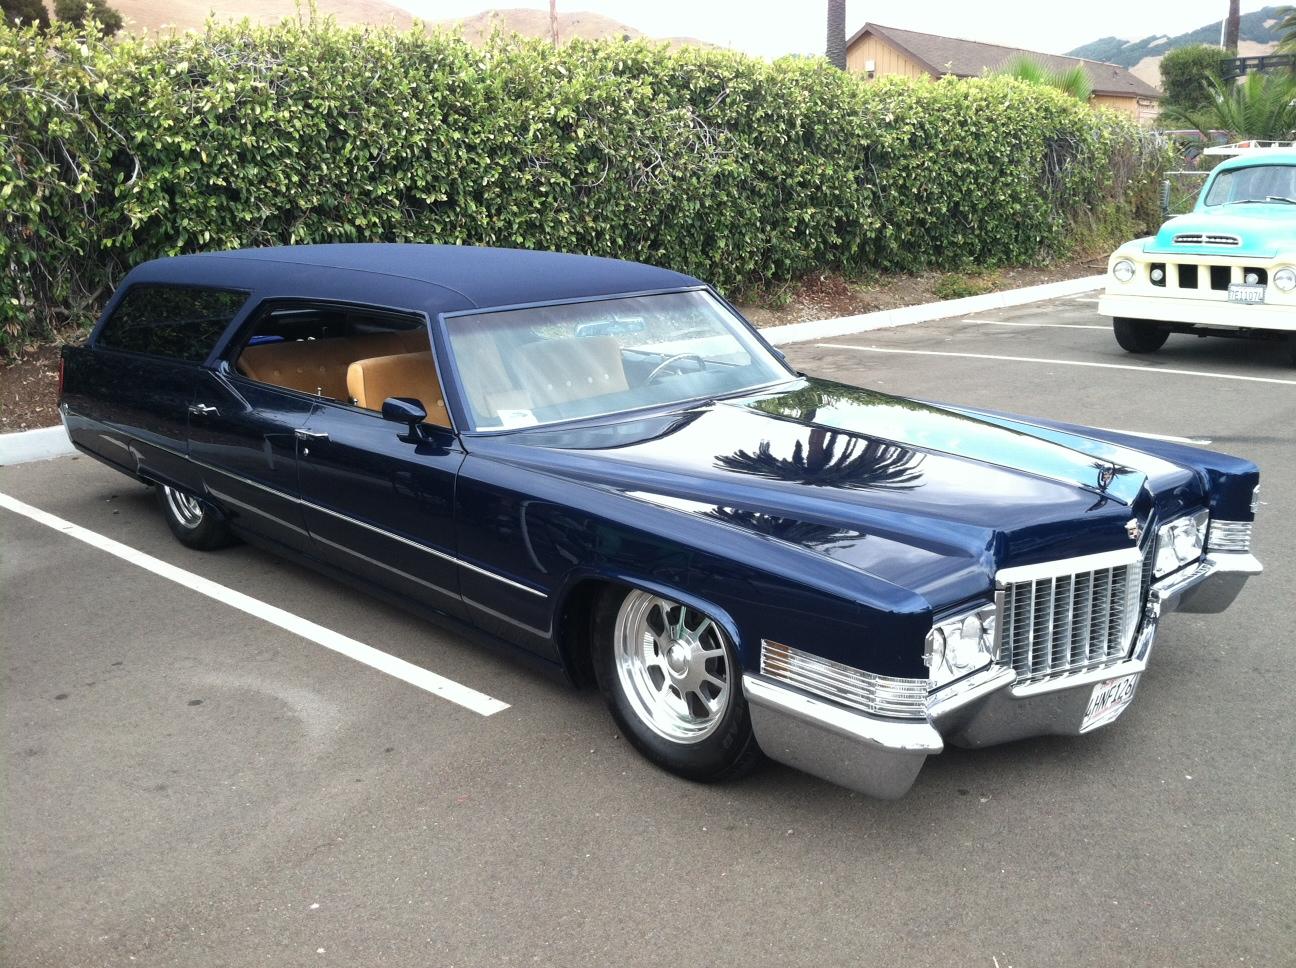 Classic Cadillac Wagon